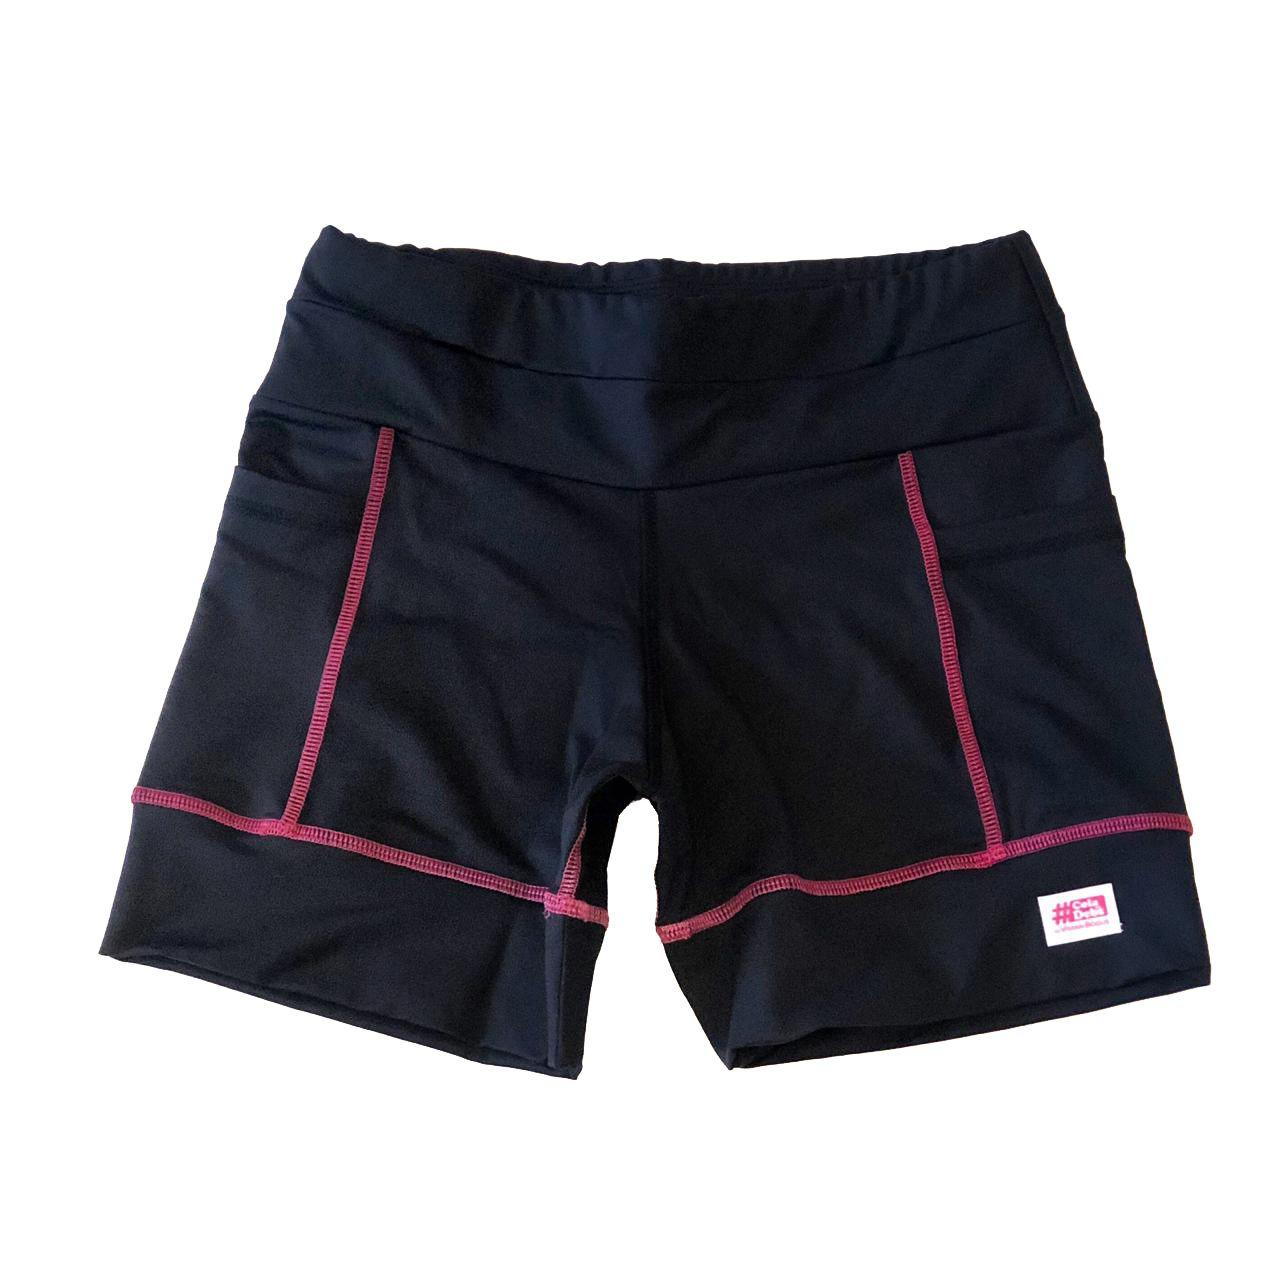 Shorts Multibolsos preto com costura rosa em compress  - Vivian Bógus